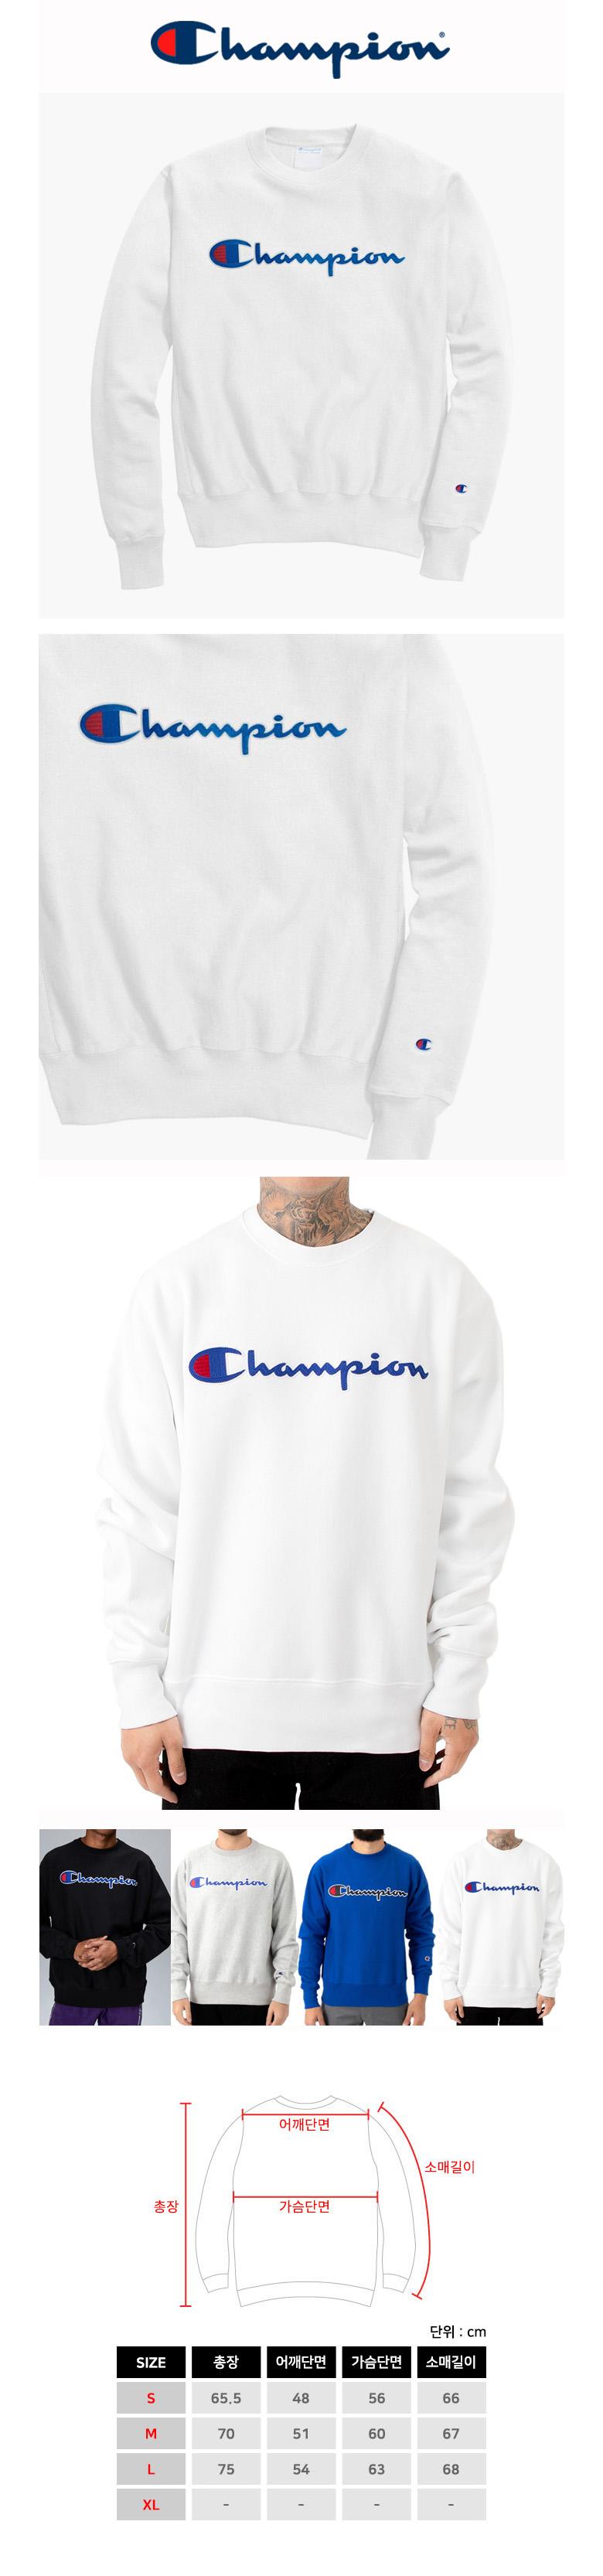 181101_champion_06.jpg